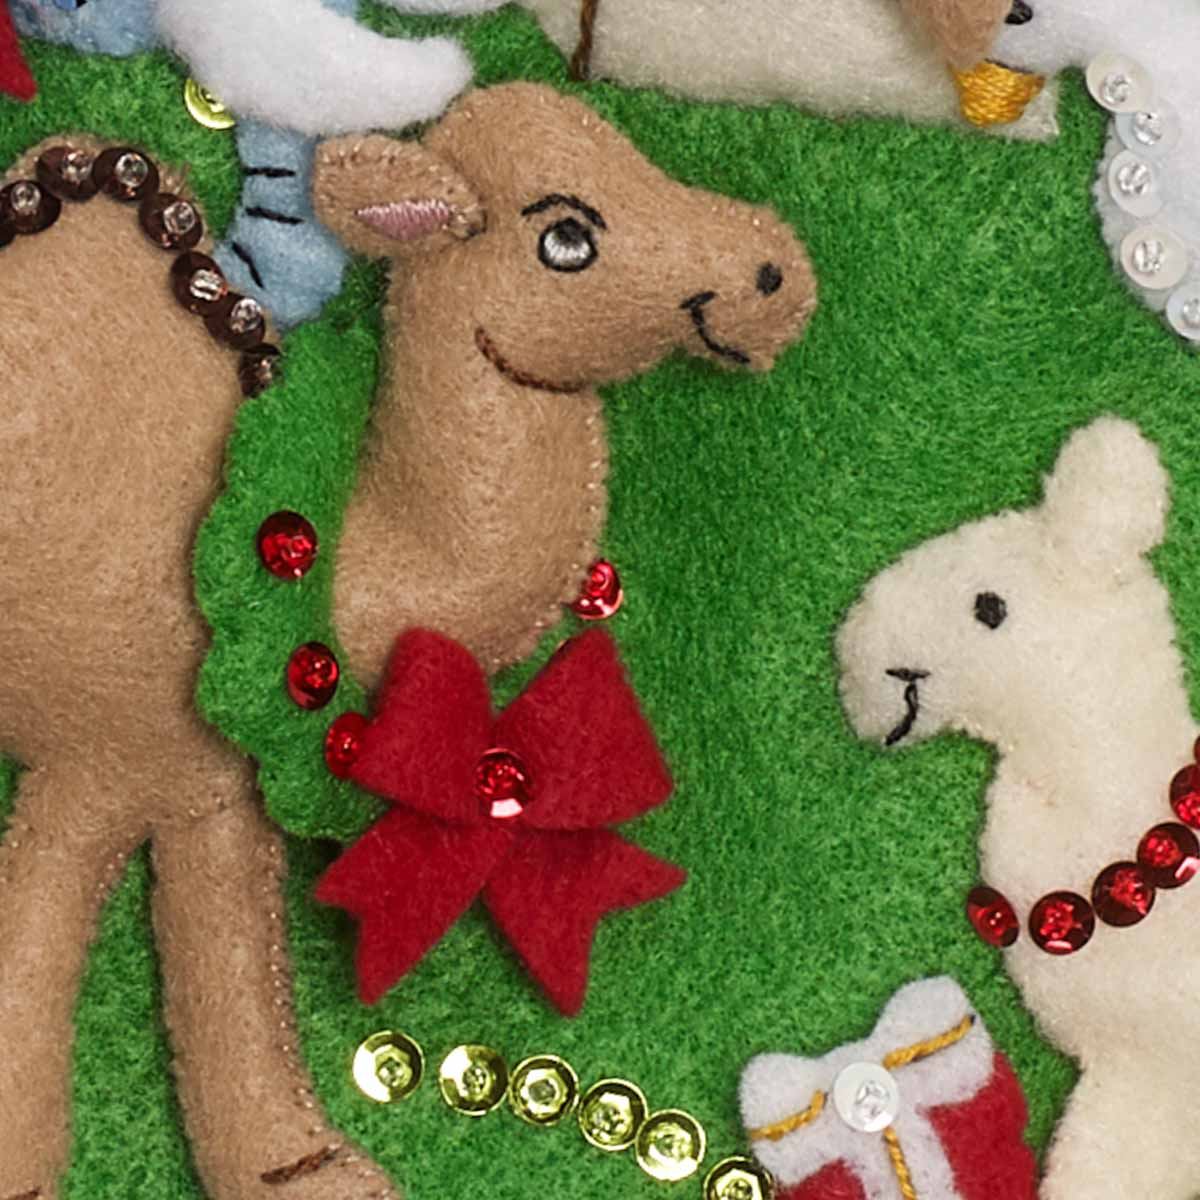 Bucilla ® Seasonal - Felt - Stocking Kits - Noah's Ark